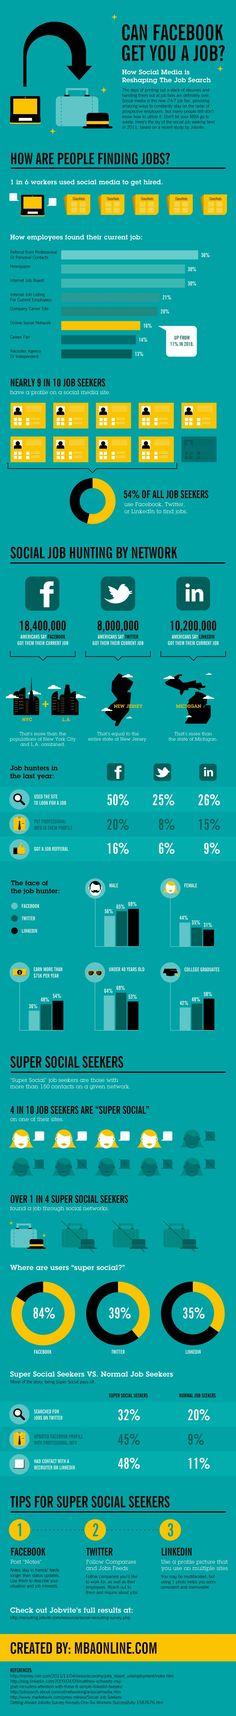 Job Hunting Through Social Media